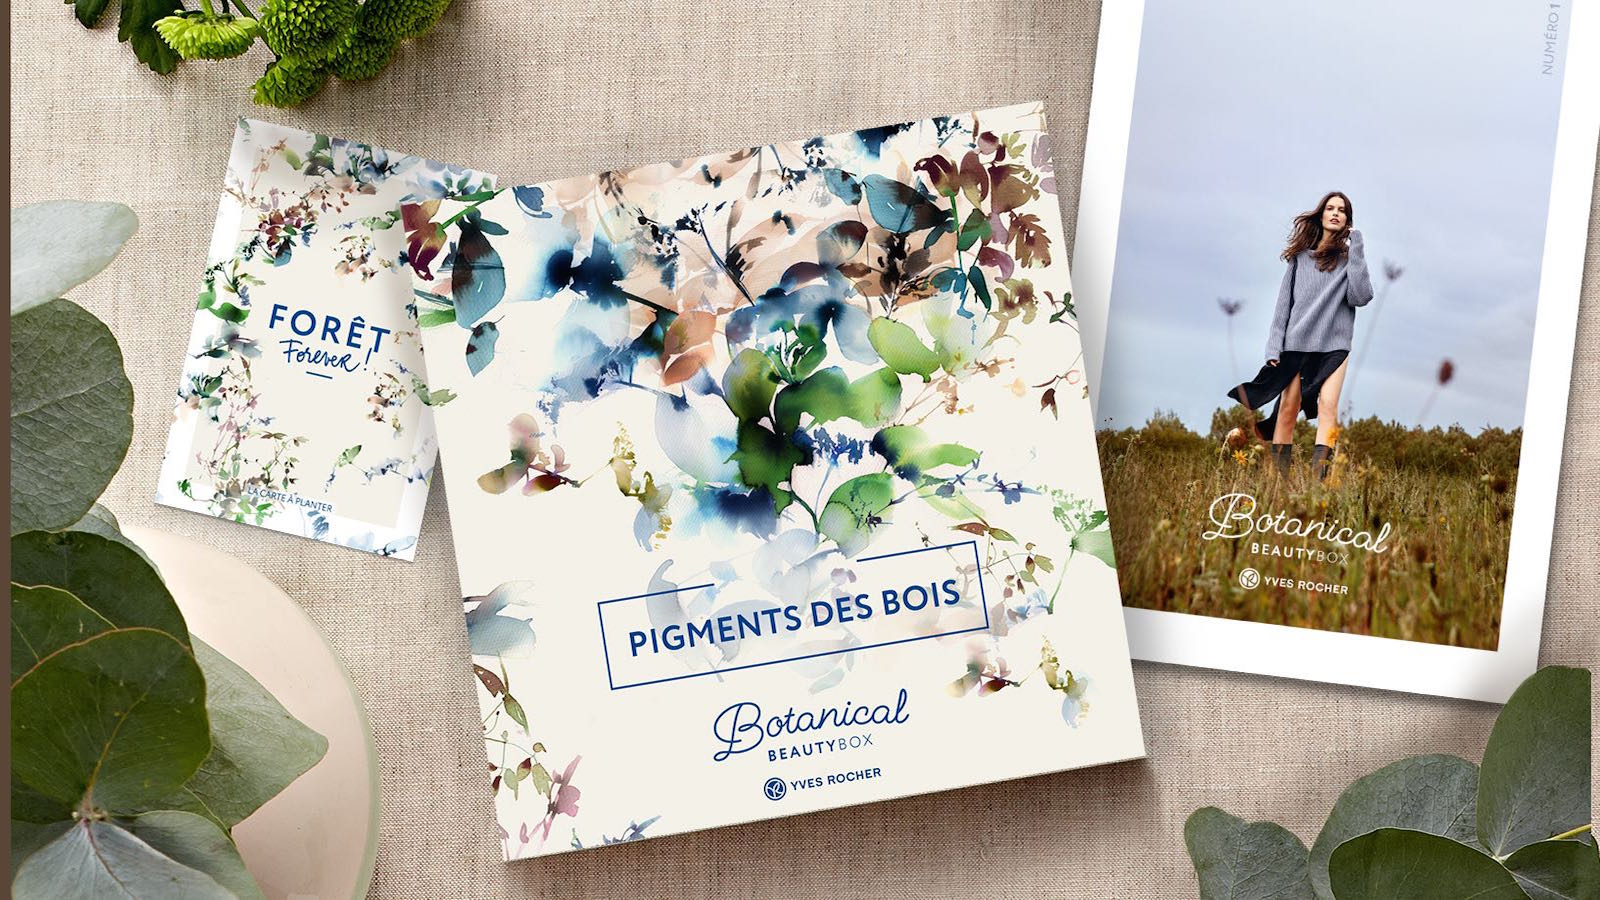 Image Botanical BeautyBox Yves Rocher